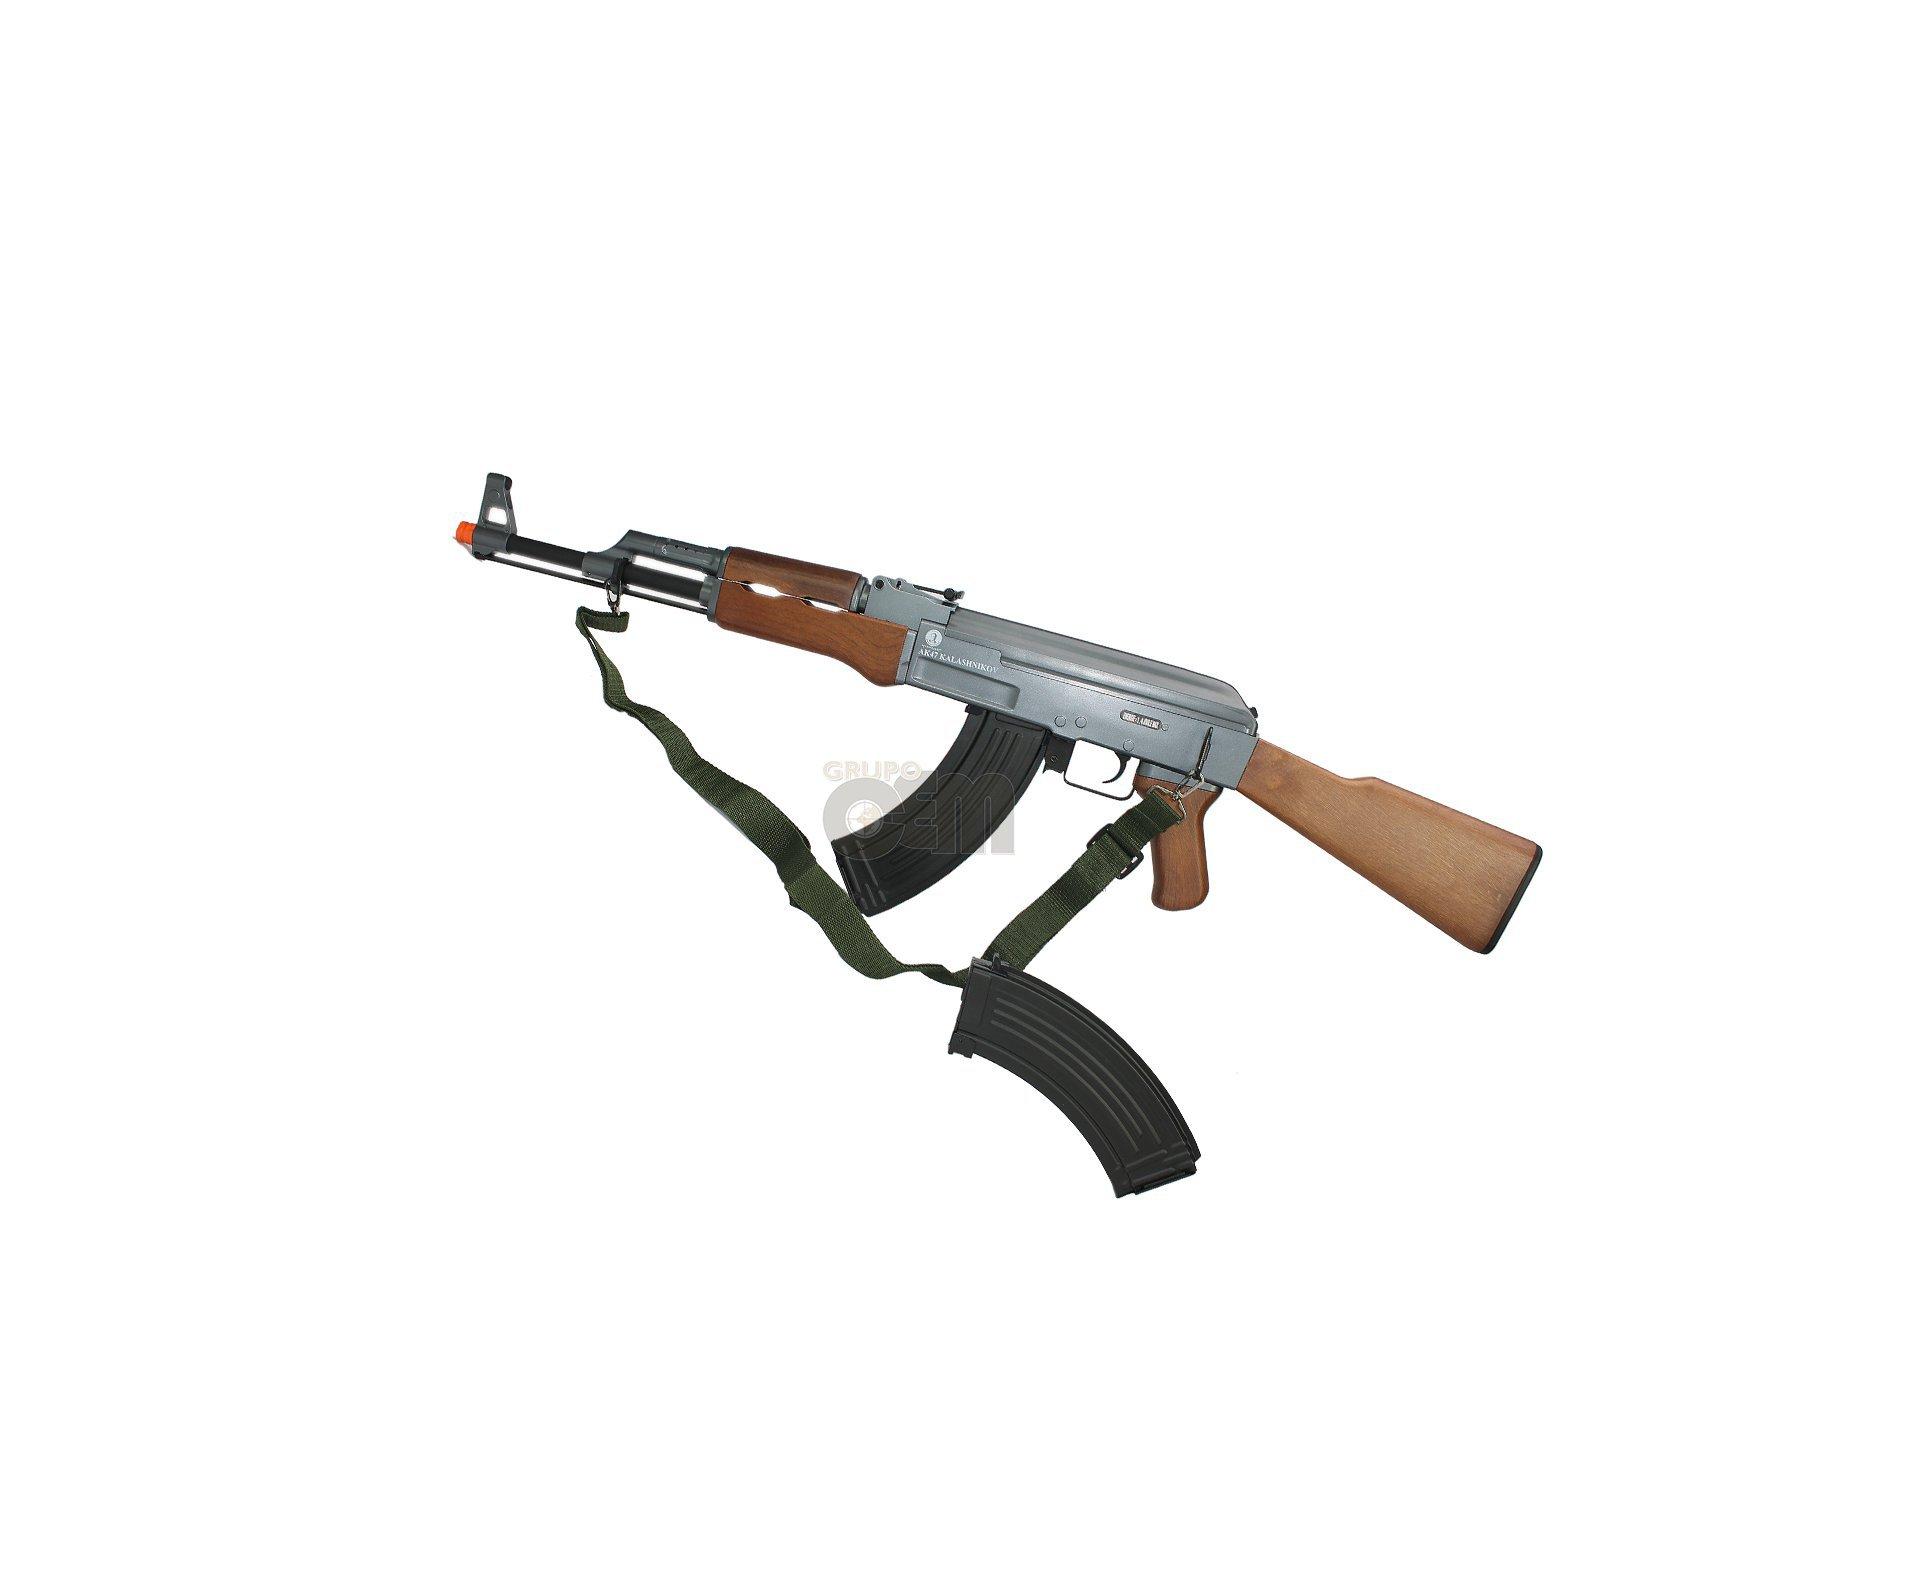 Rifle De Airsoft Kalashnikov Ak47 2mag - Cibergun